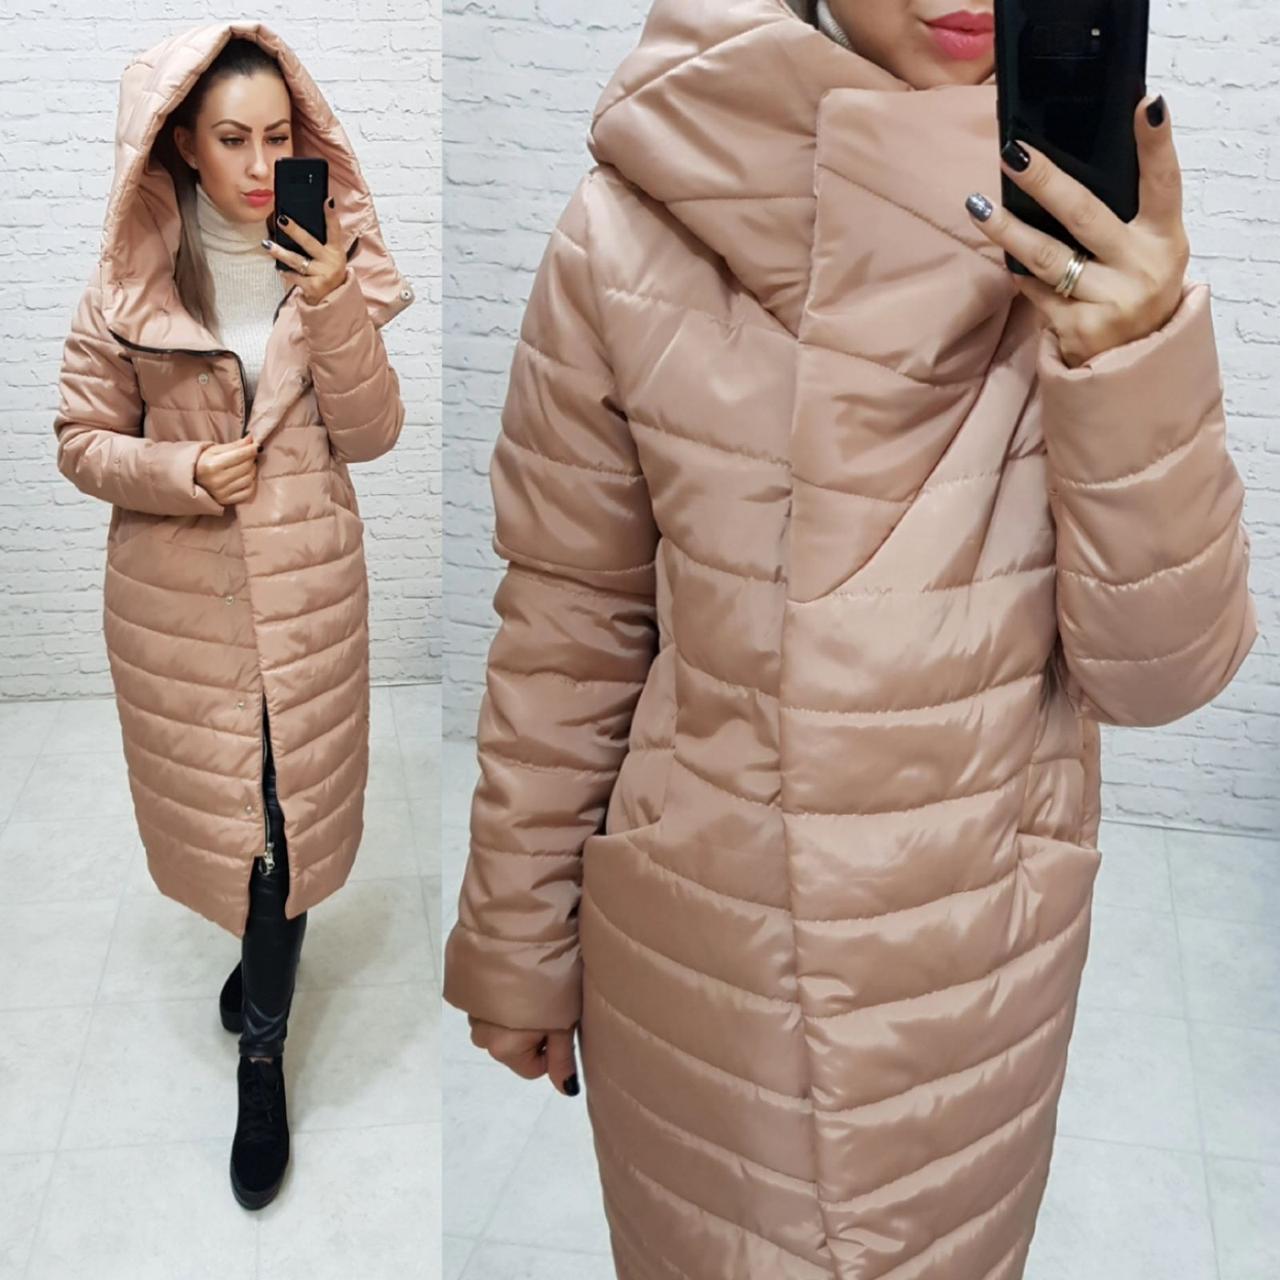 Куртка кокон зимняя стеганная арт. 180 плащевка Мадонна цвет бежевый / бежевого цвета / беж